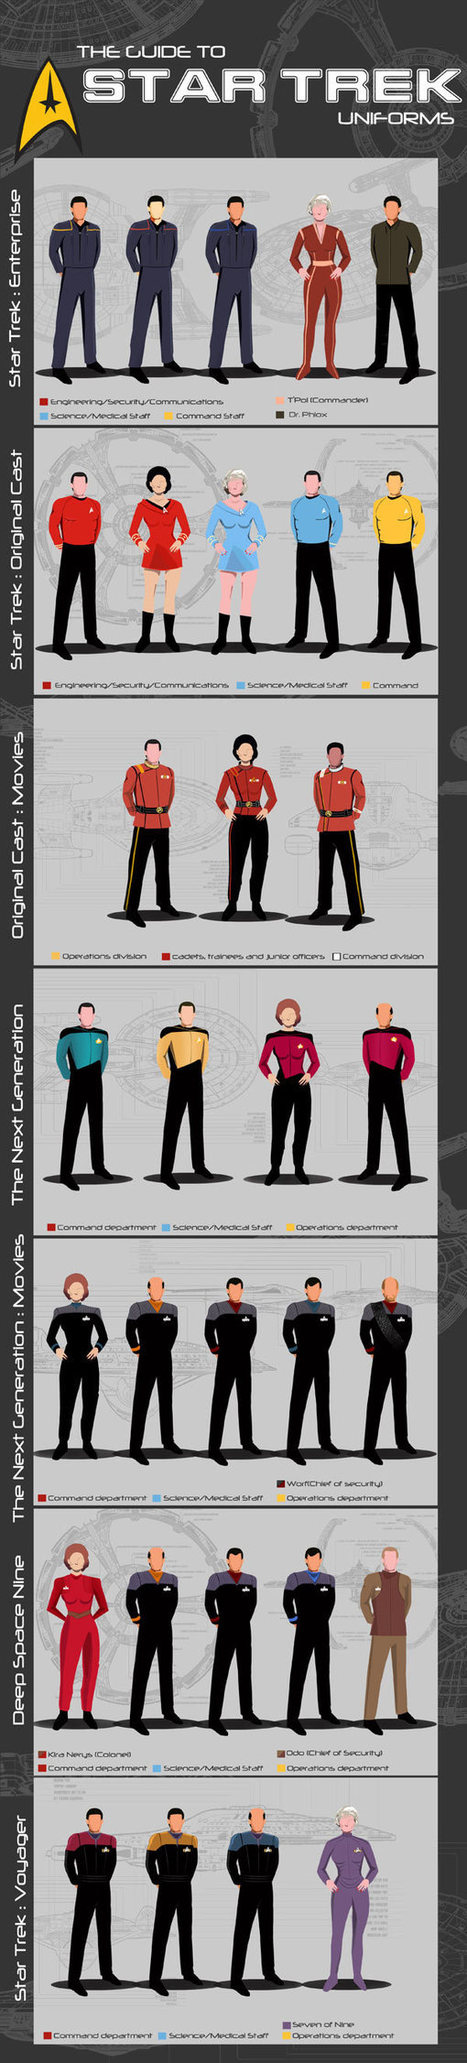 guidetostartrekuniforms-small.jpg (600x2651 pixels) | Costume for Journey to Space | Scoop.it